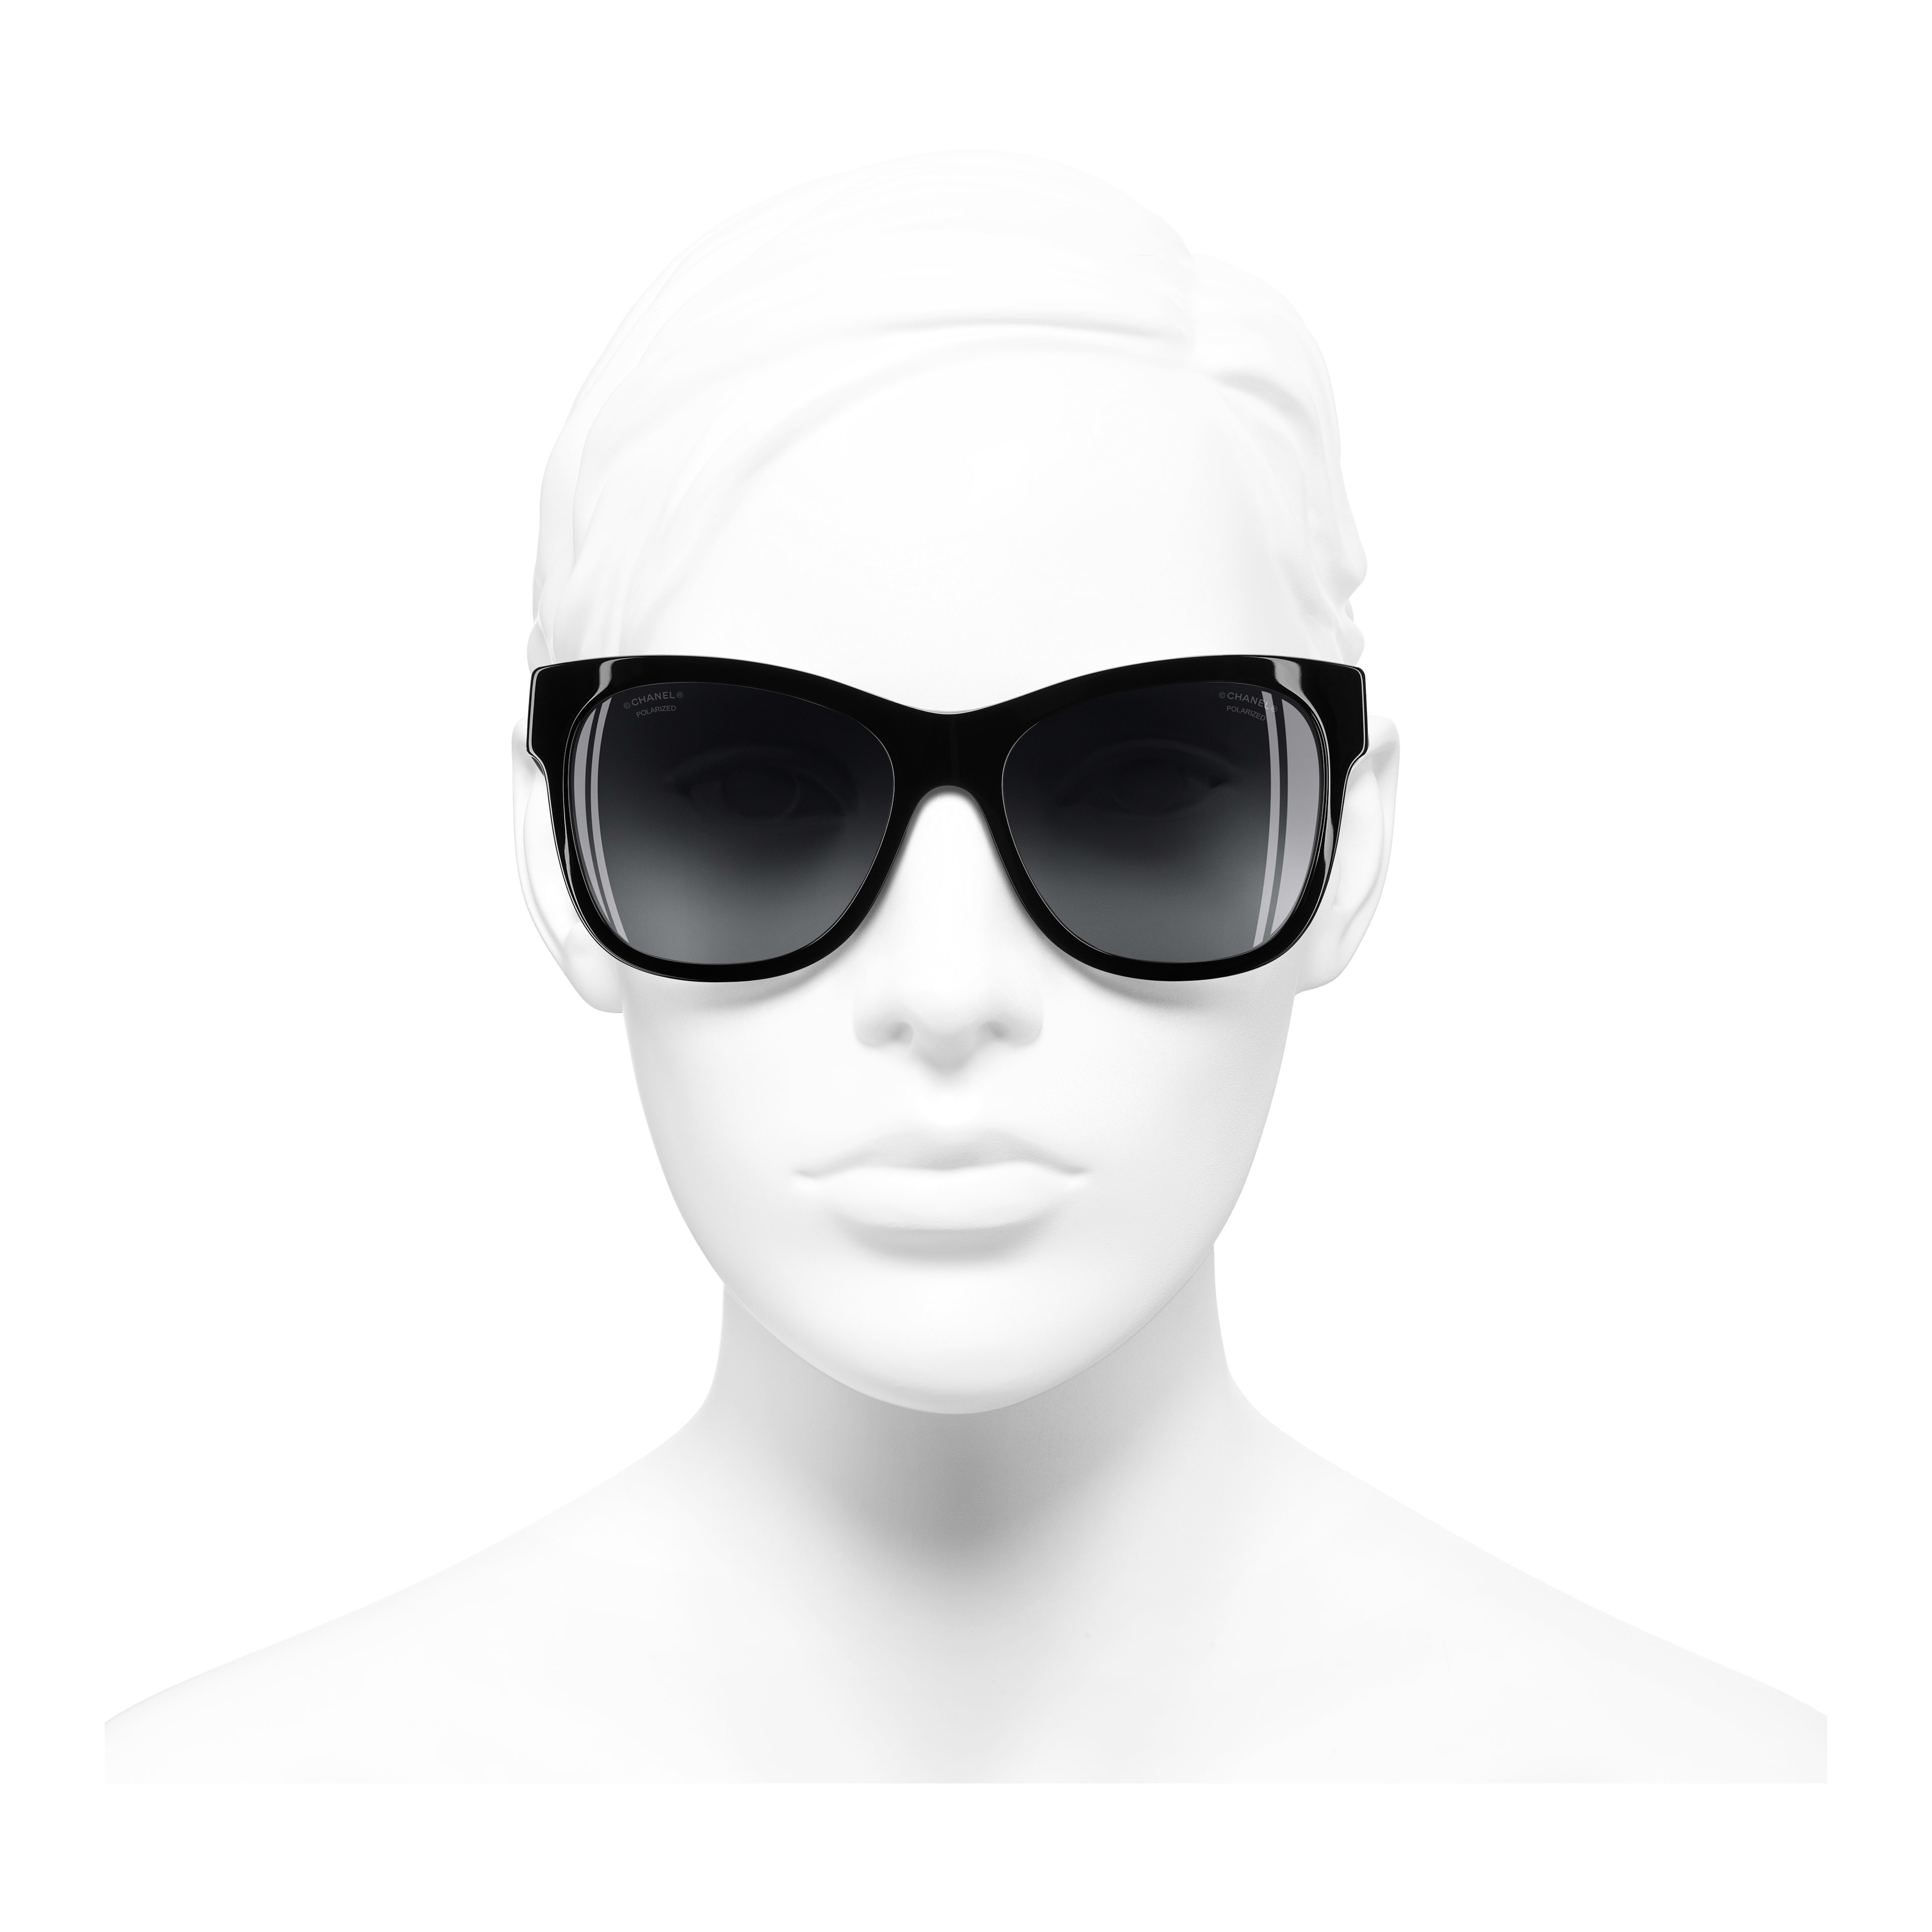 Square Sunglasses Acetate - Polarized Lenses Black -                                                                     view 2 - see full sized version